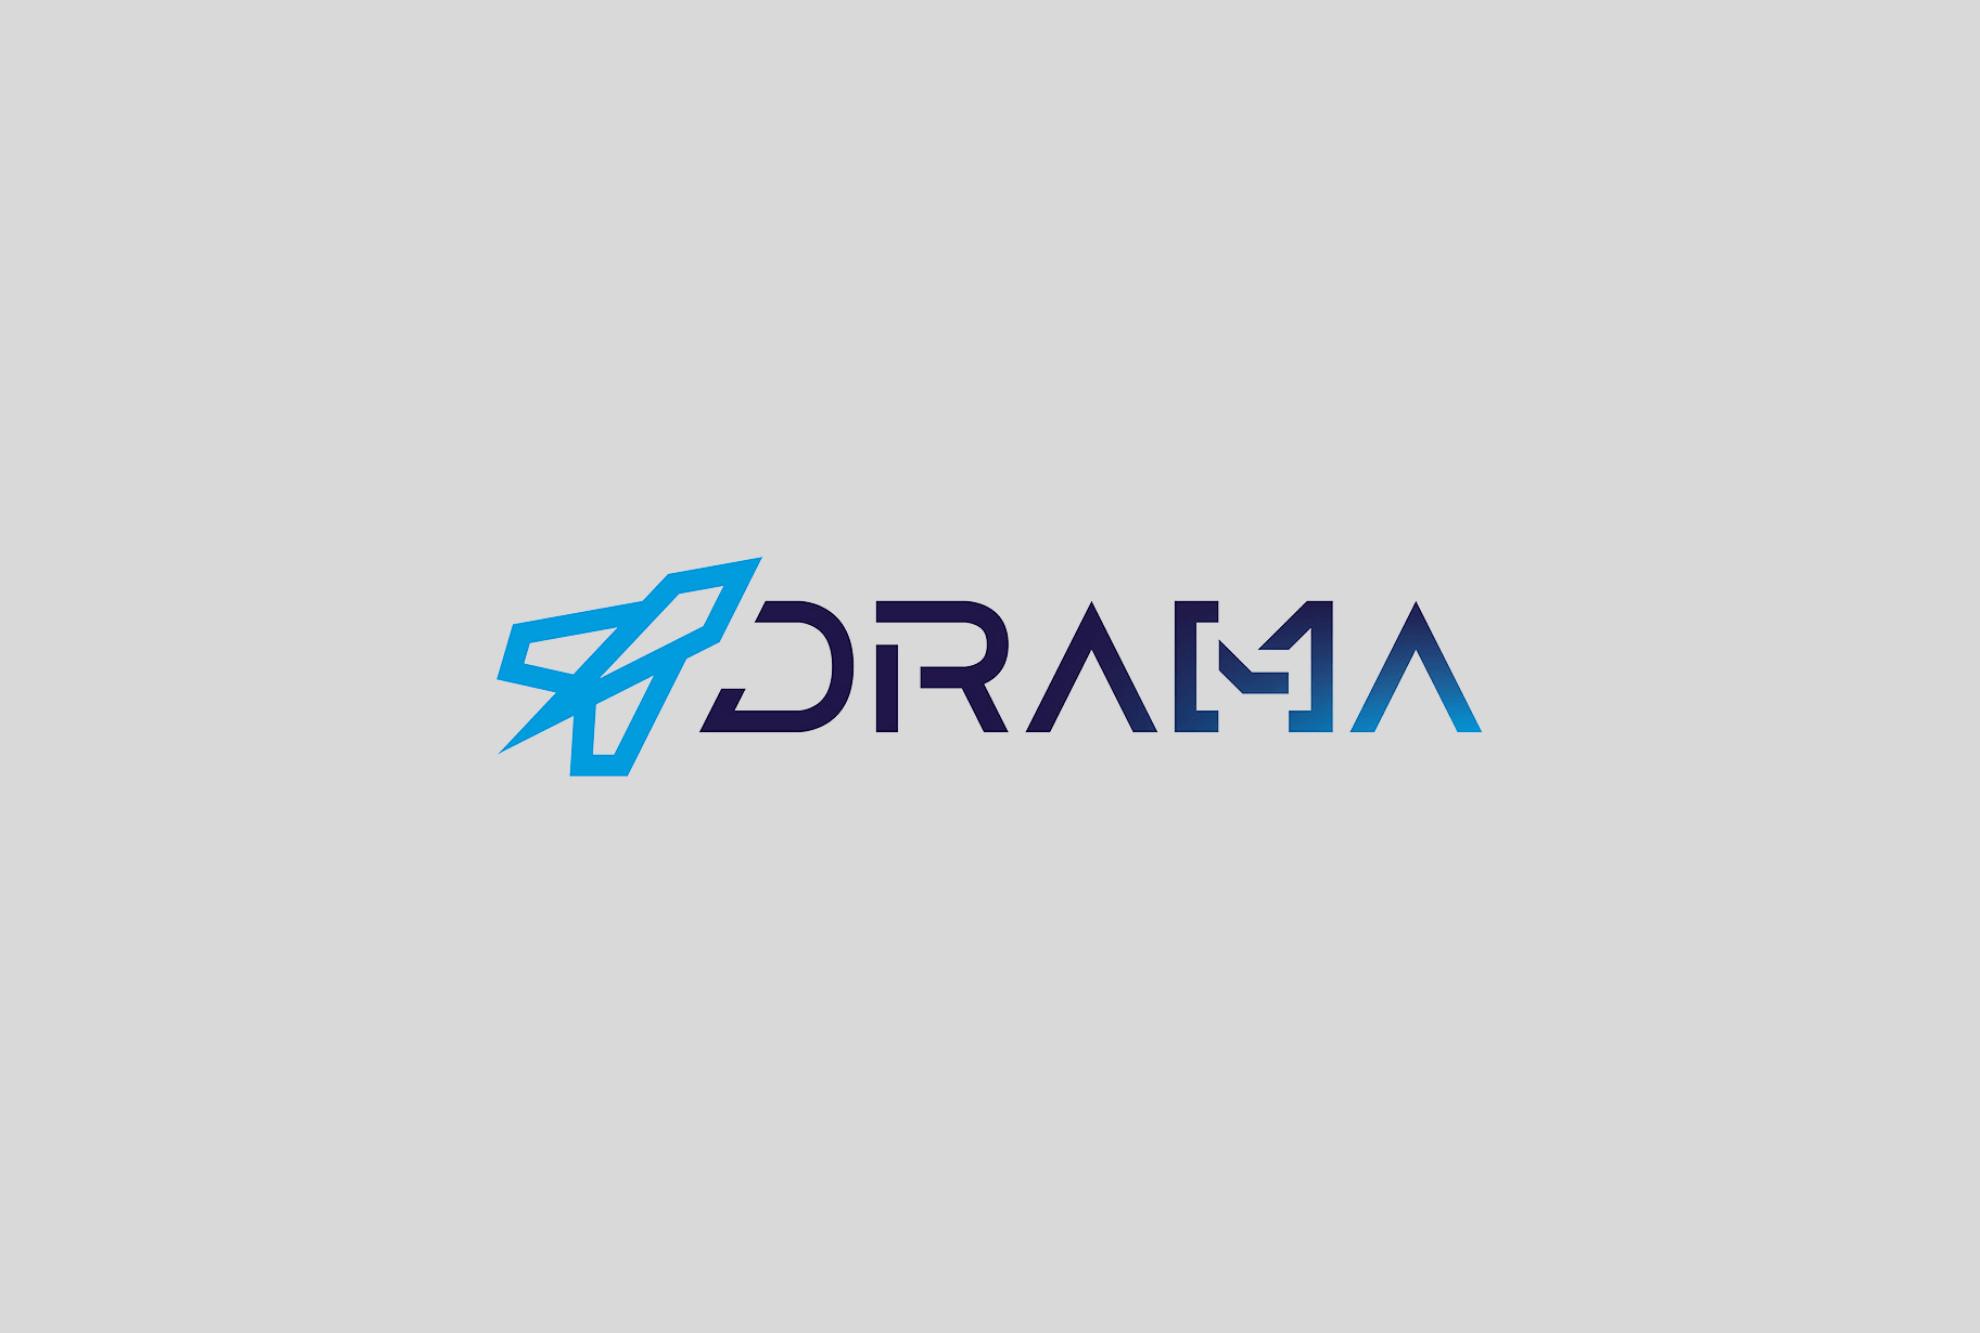 DRAMA program by MTC UK